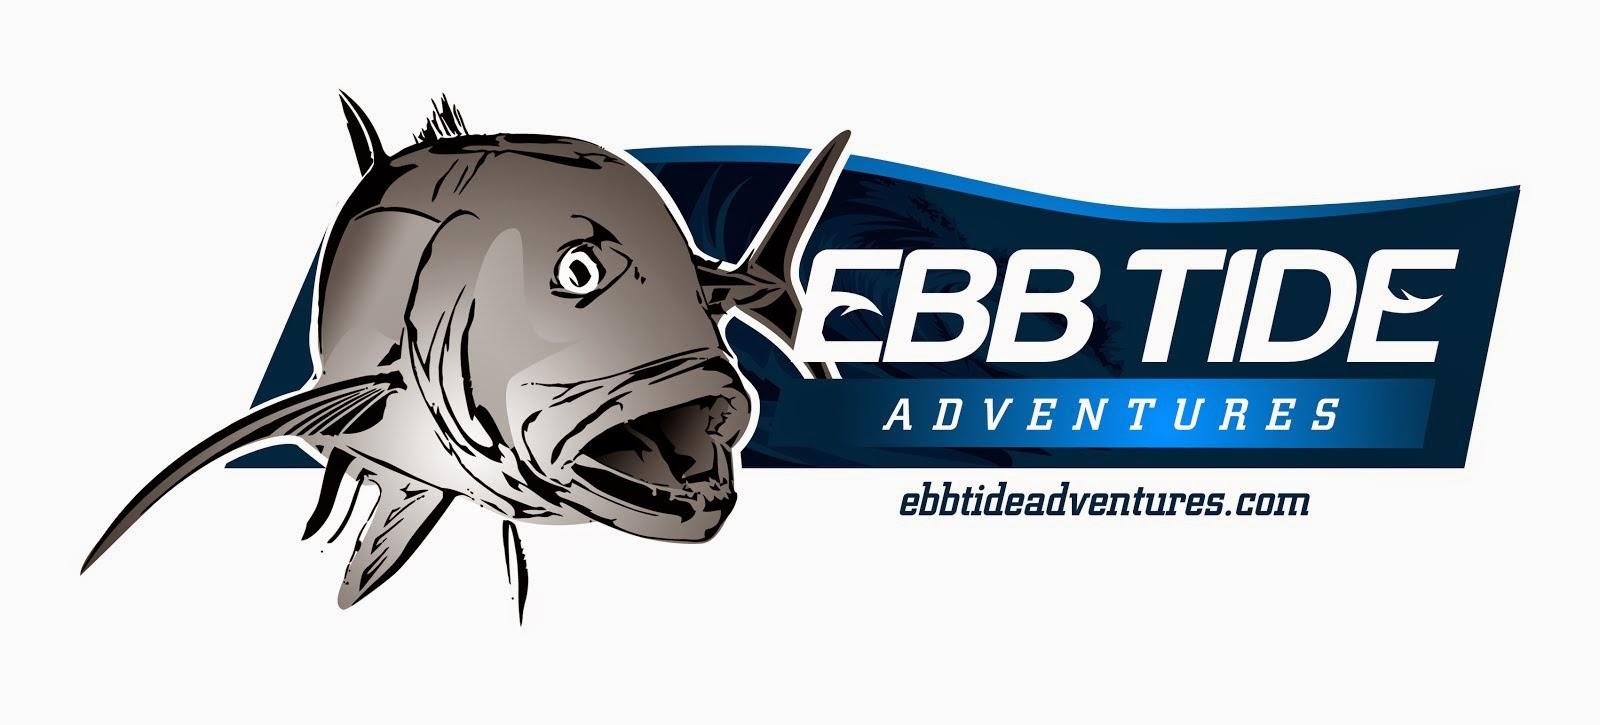 Return to Ebb Tide Adventures